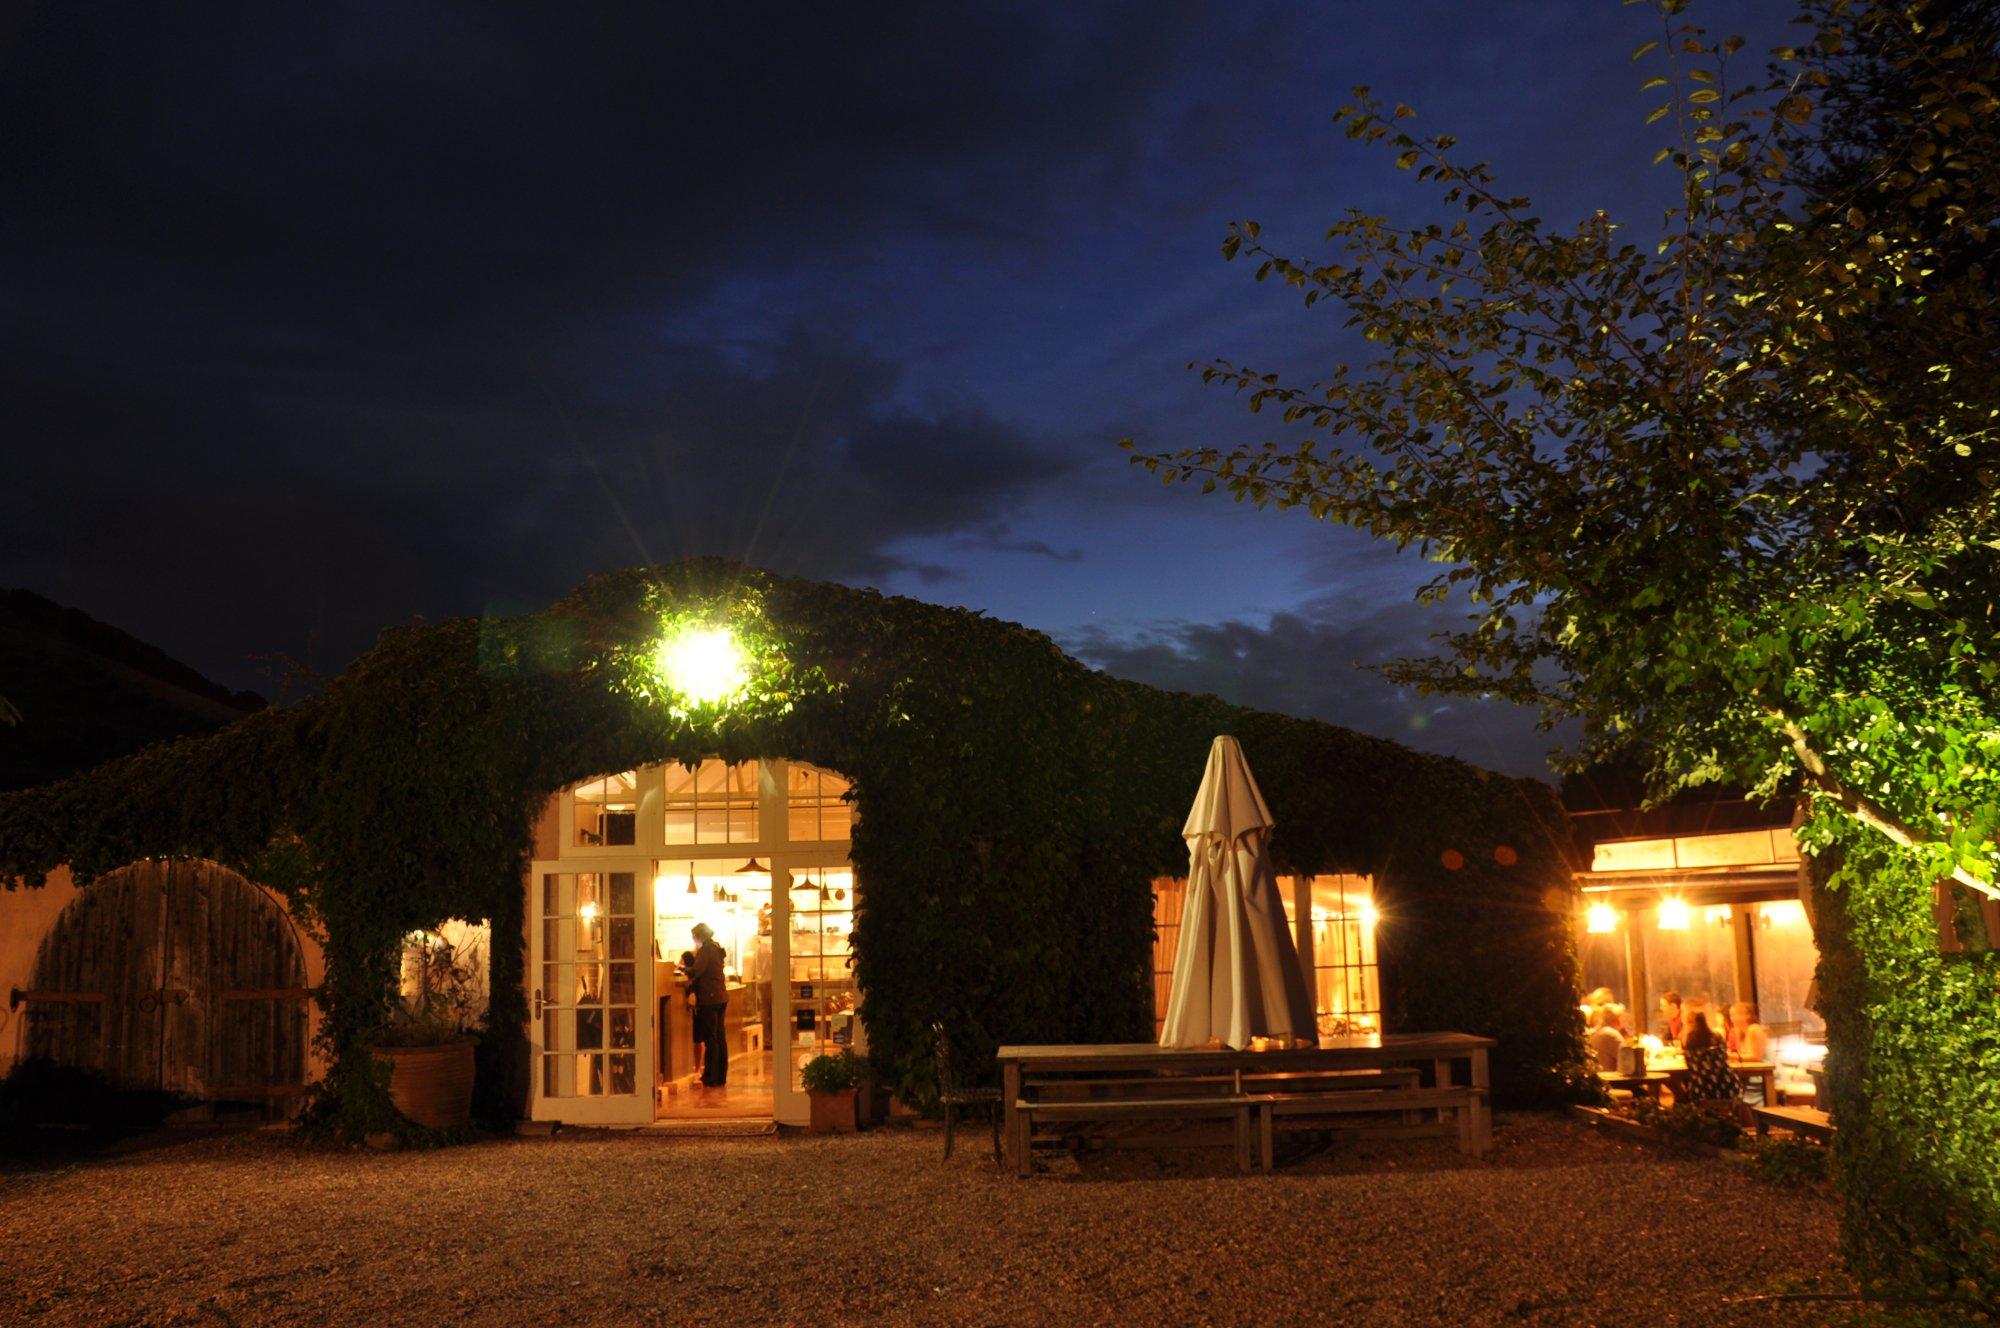 night-view-of-the-restaurant.jpg